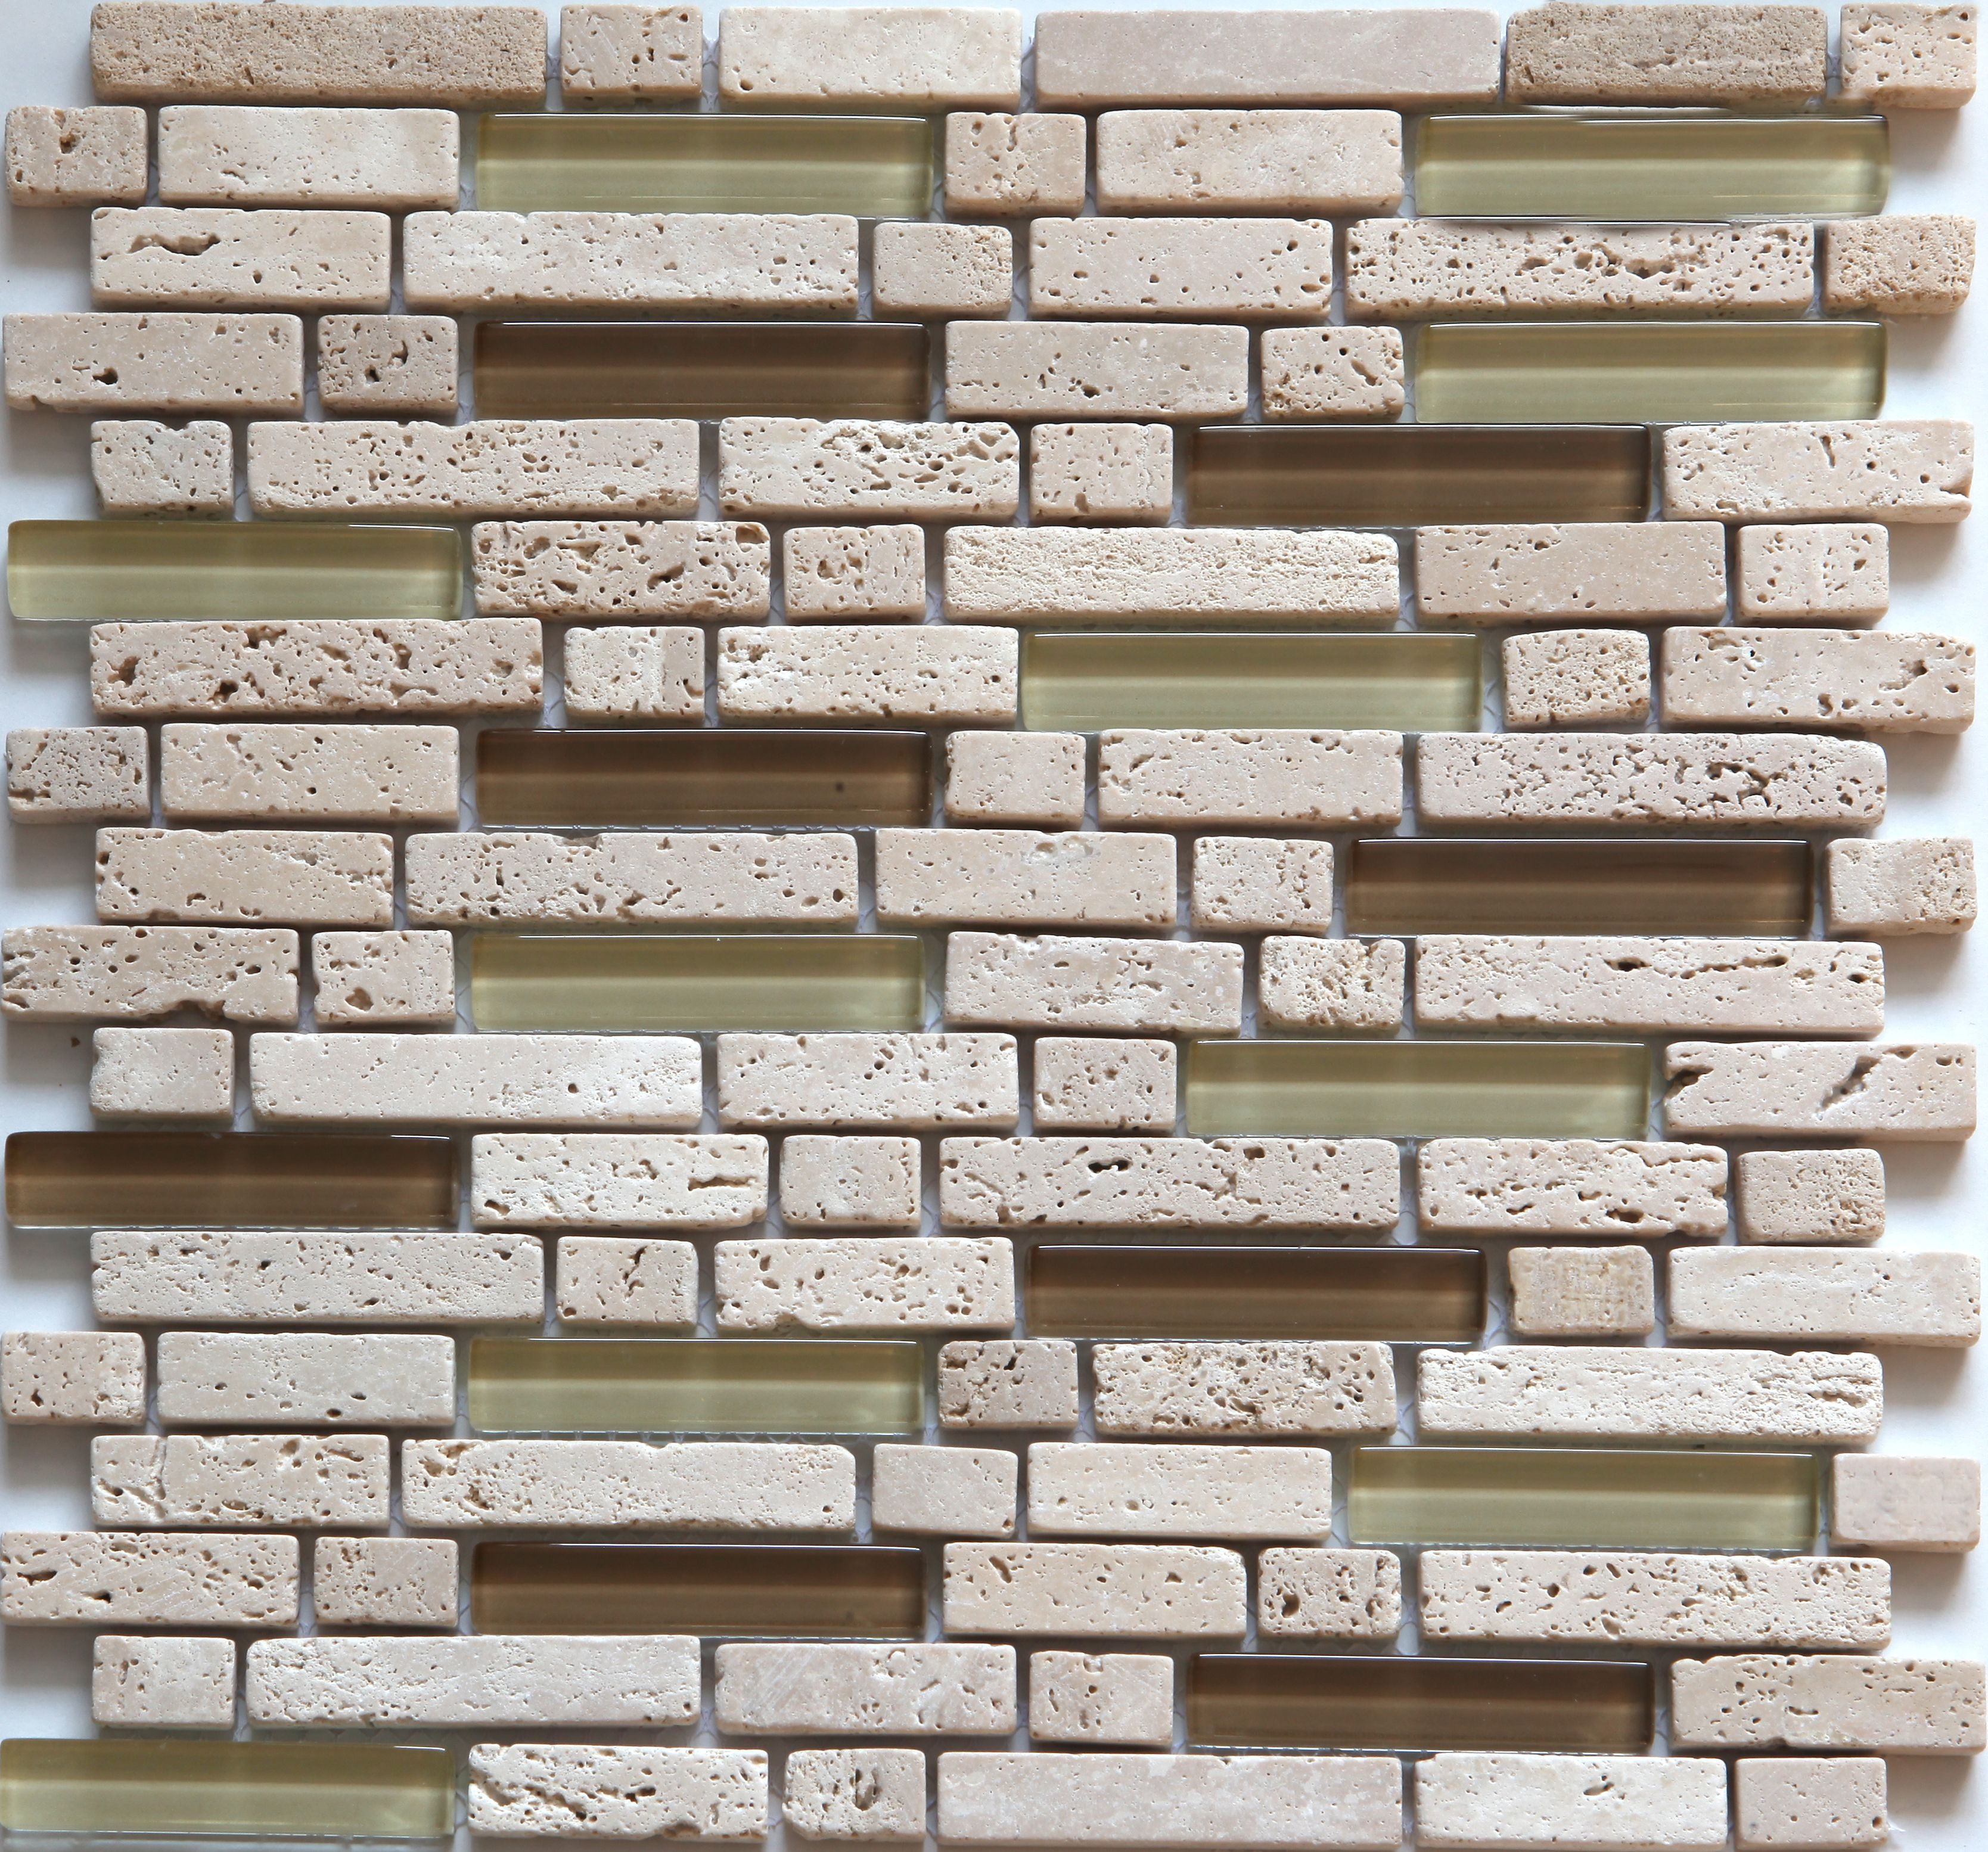 Cagliari Beige & Brown Glass & Travertine Mosaic Tile, (l)300mm (w)300mm